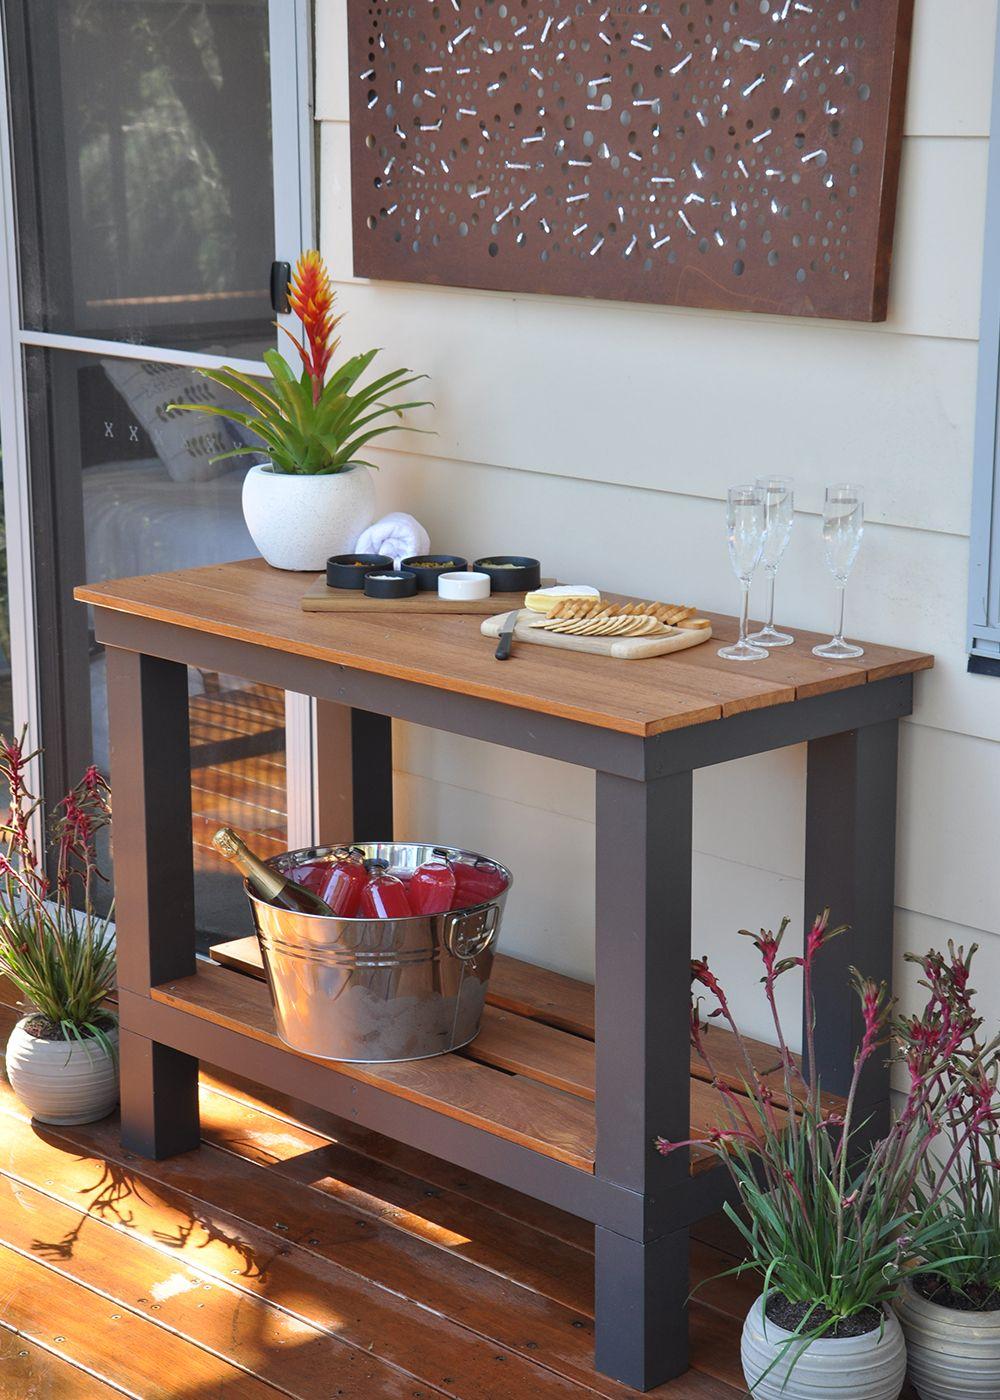 DIY outdoor bench | Ikea garden furniture, Outdoor garden ...